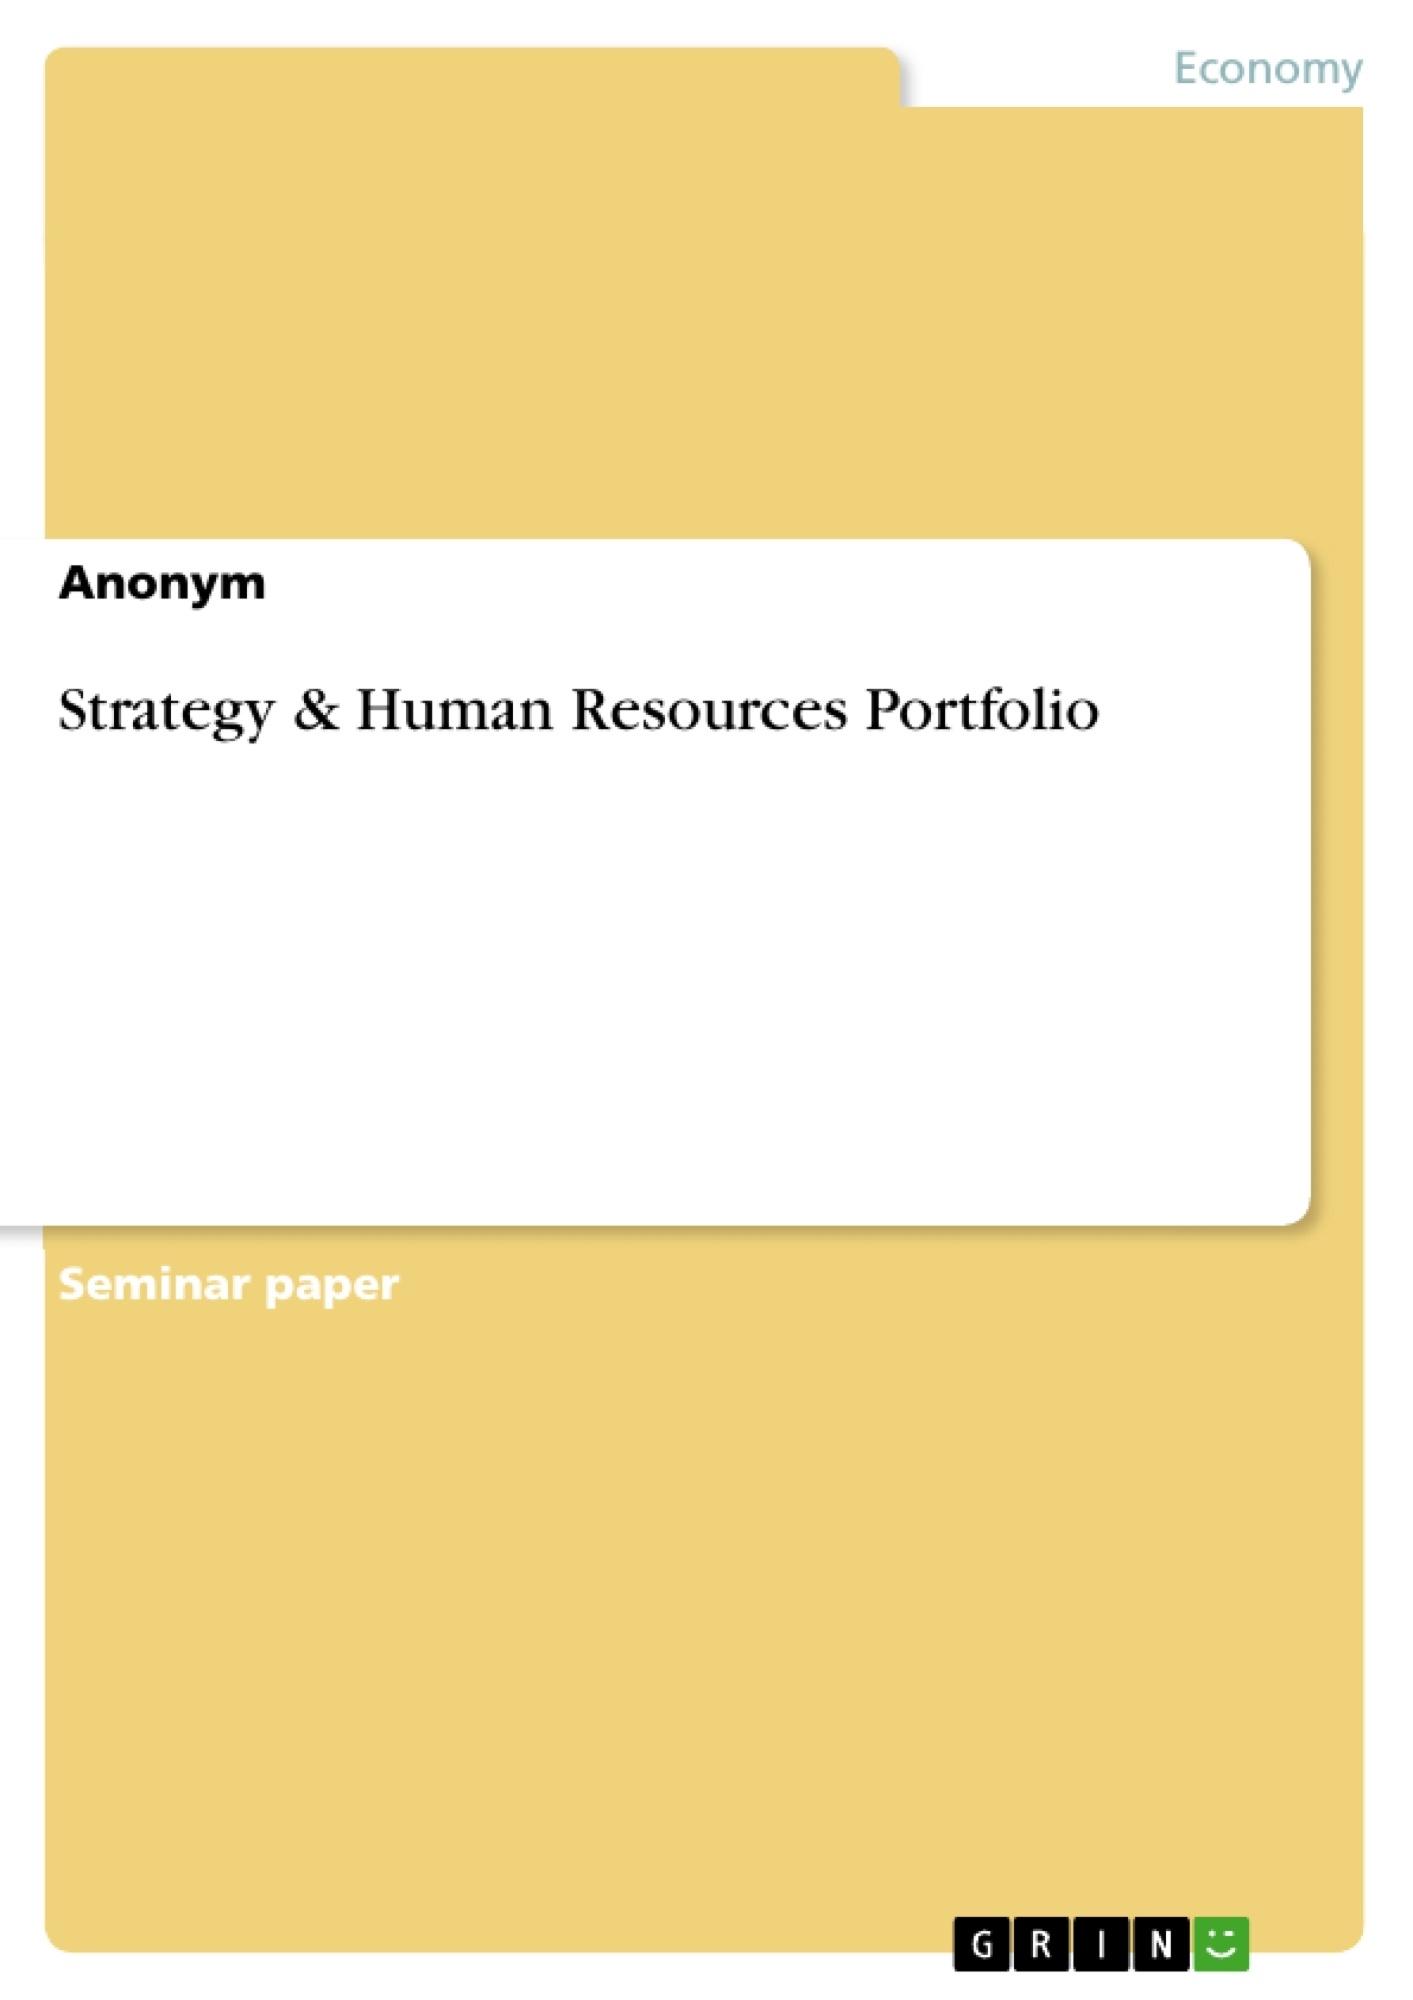 Title: Strategy & Human Resources Portfolio